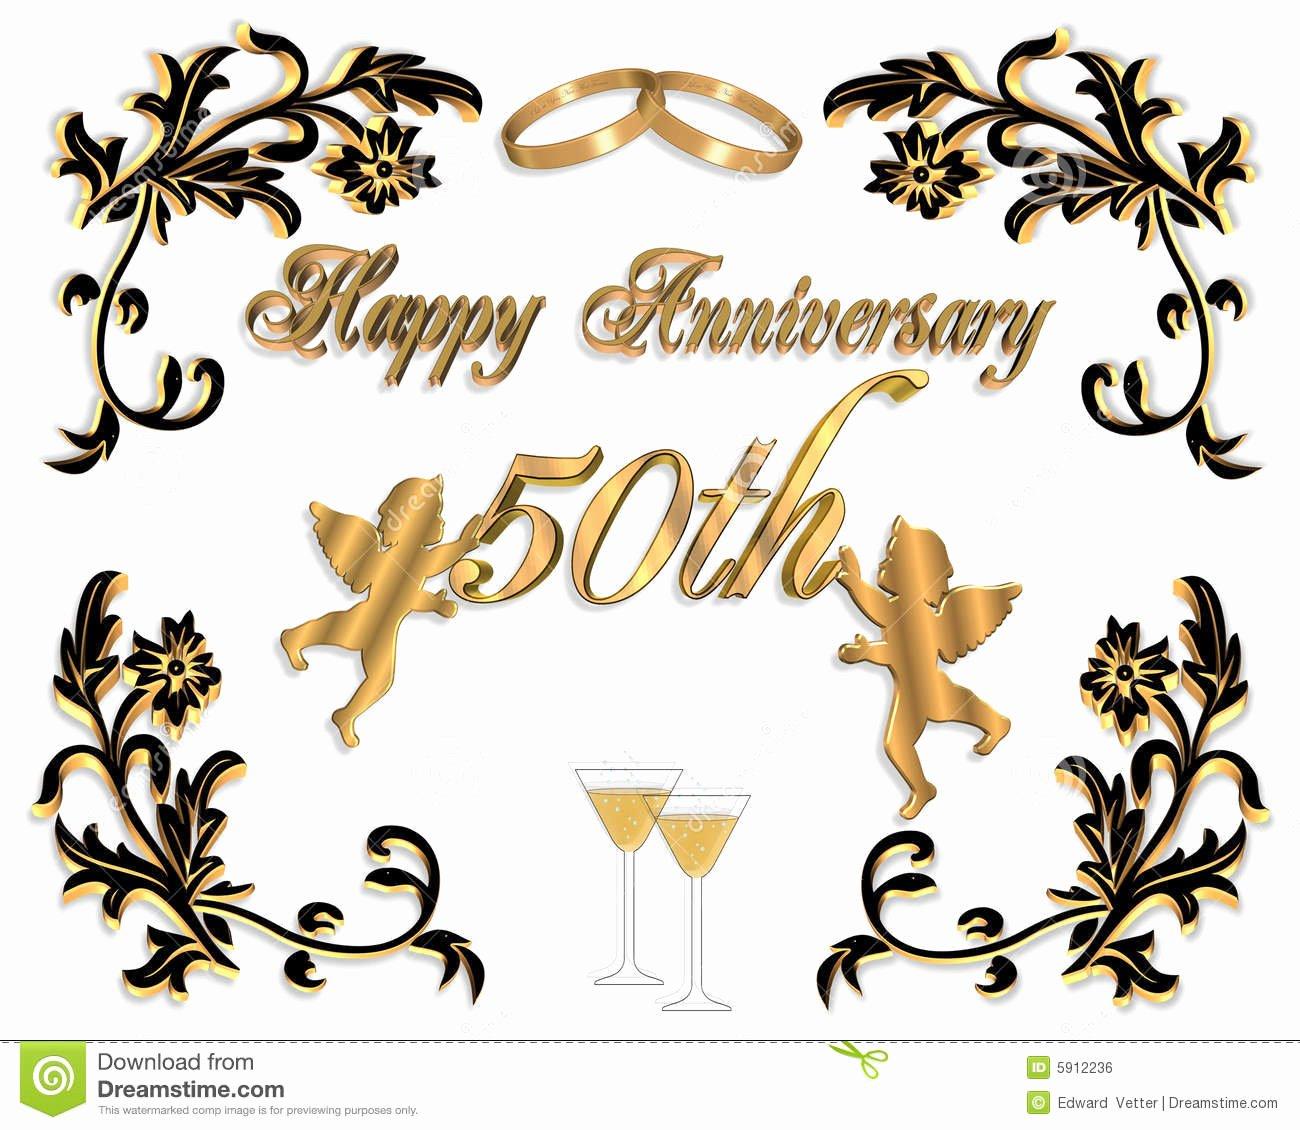 50th Wedding Anniversary Invitation Template Awesome 50th Anniversary Invitation Templates Free